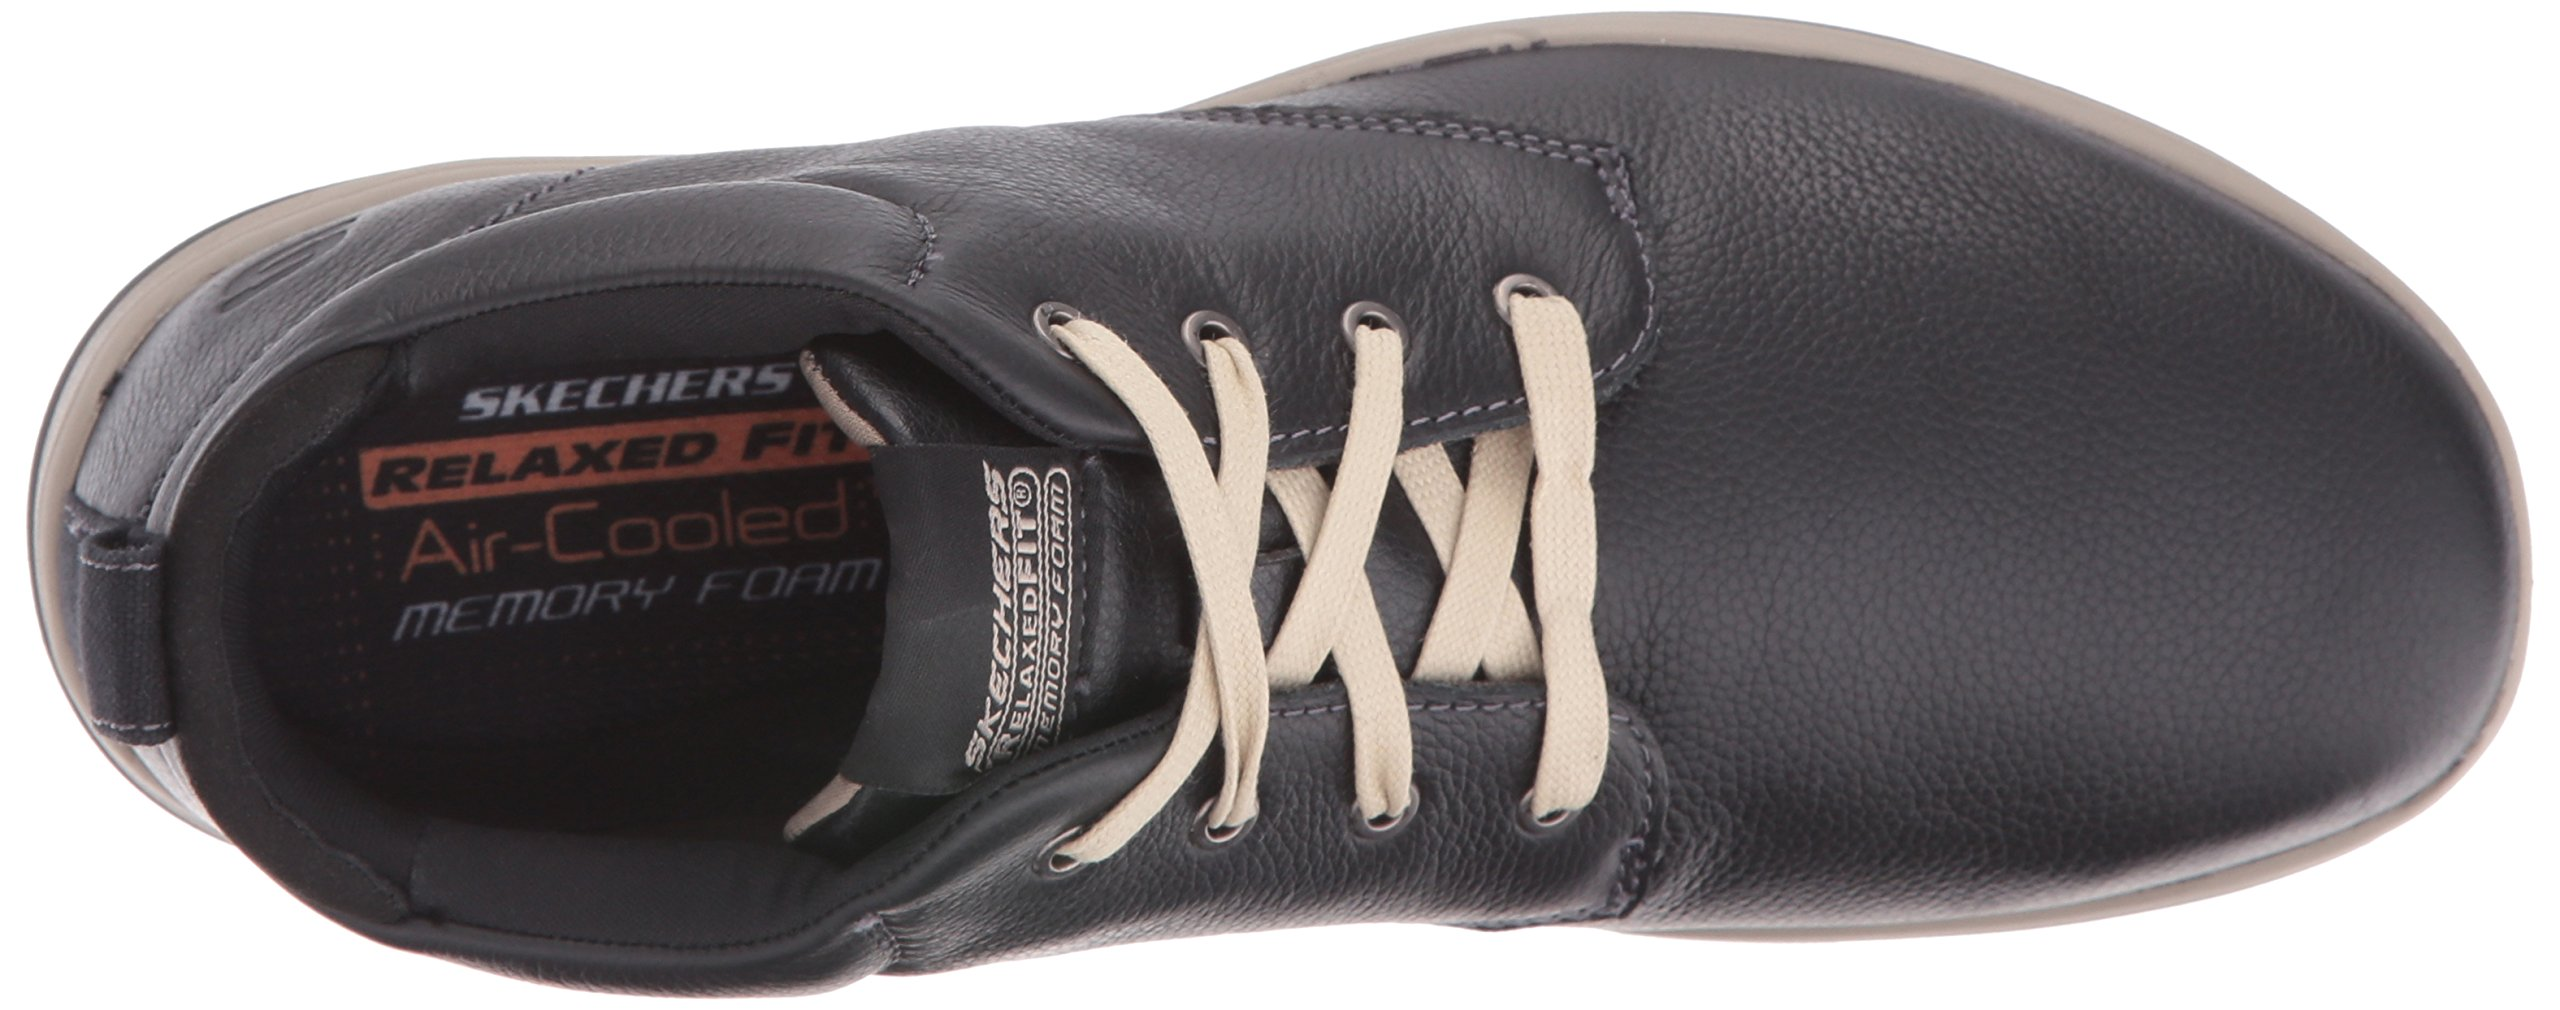 8812b13c7698 Skechers USA Men s Harper Meldon Chukka Boot   Chukka   Clothing ...